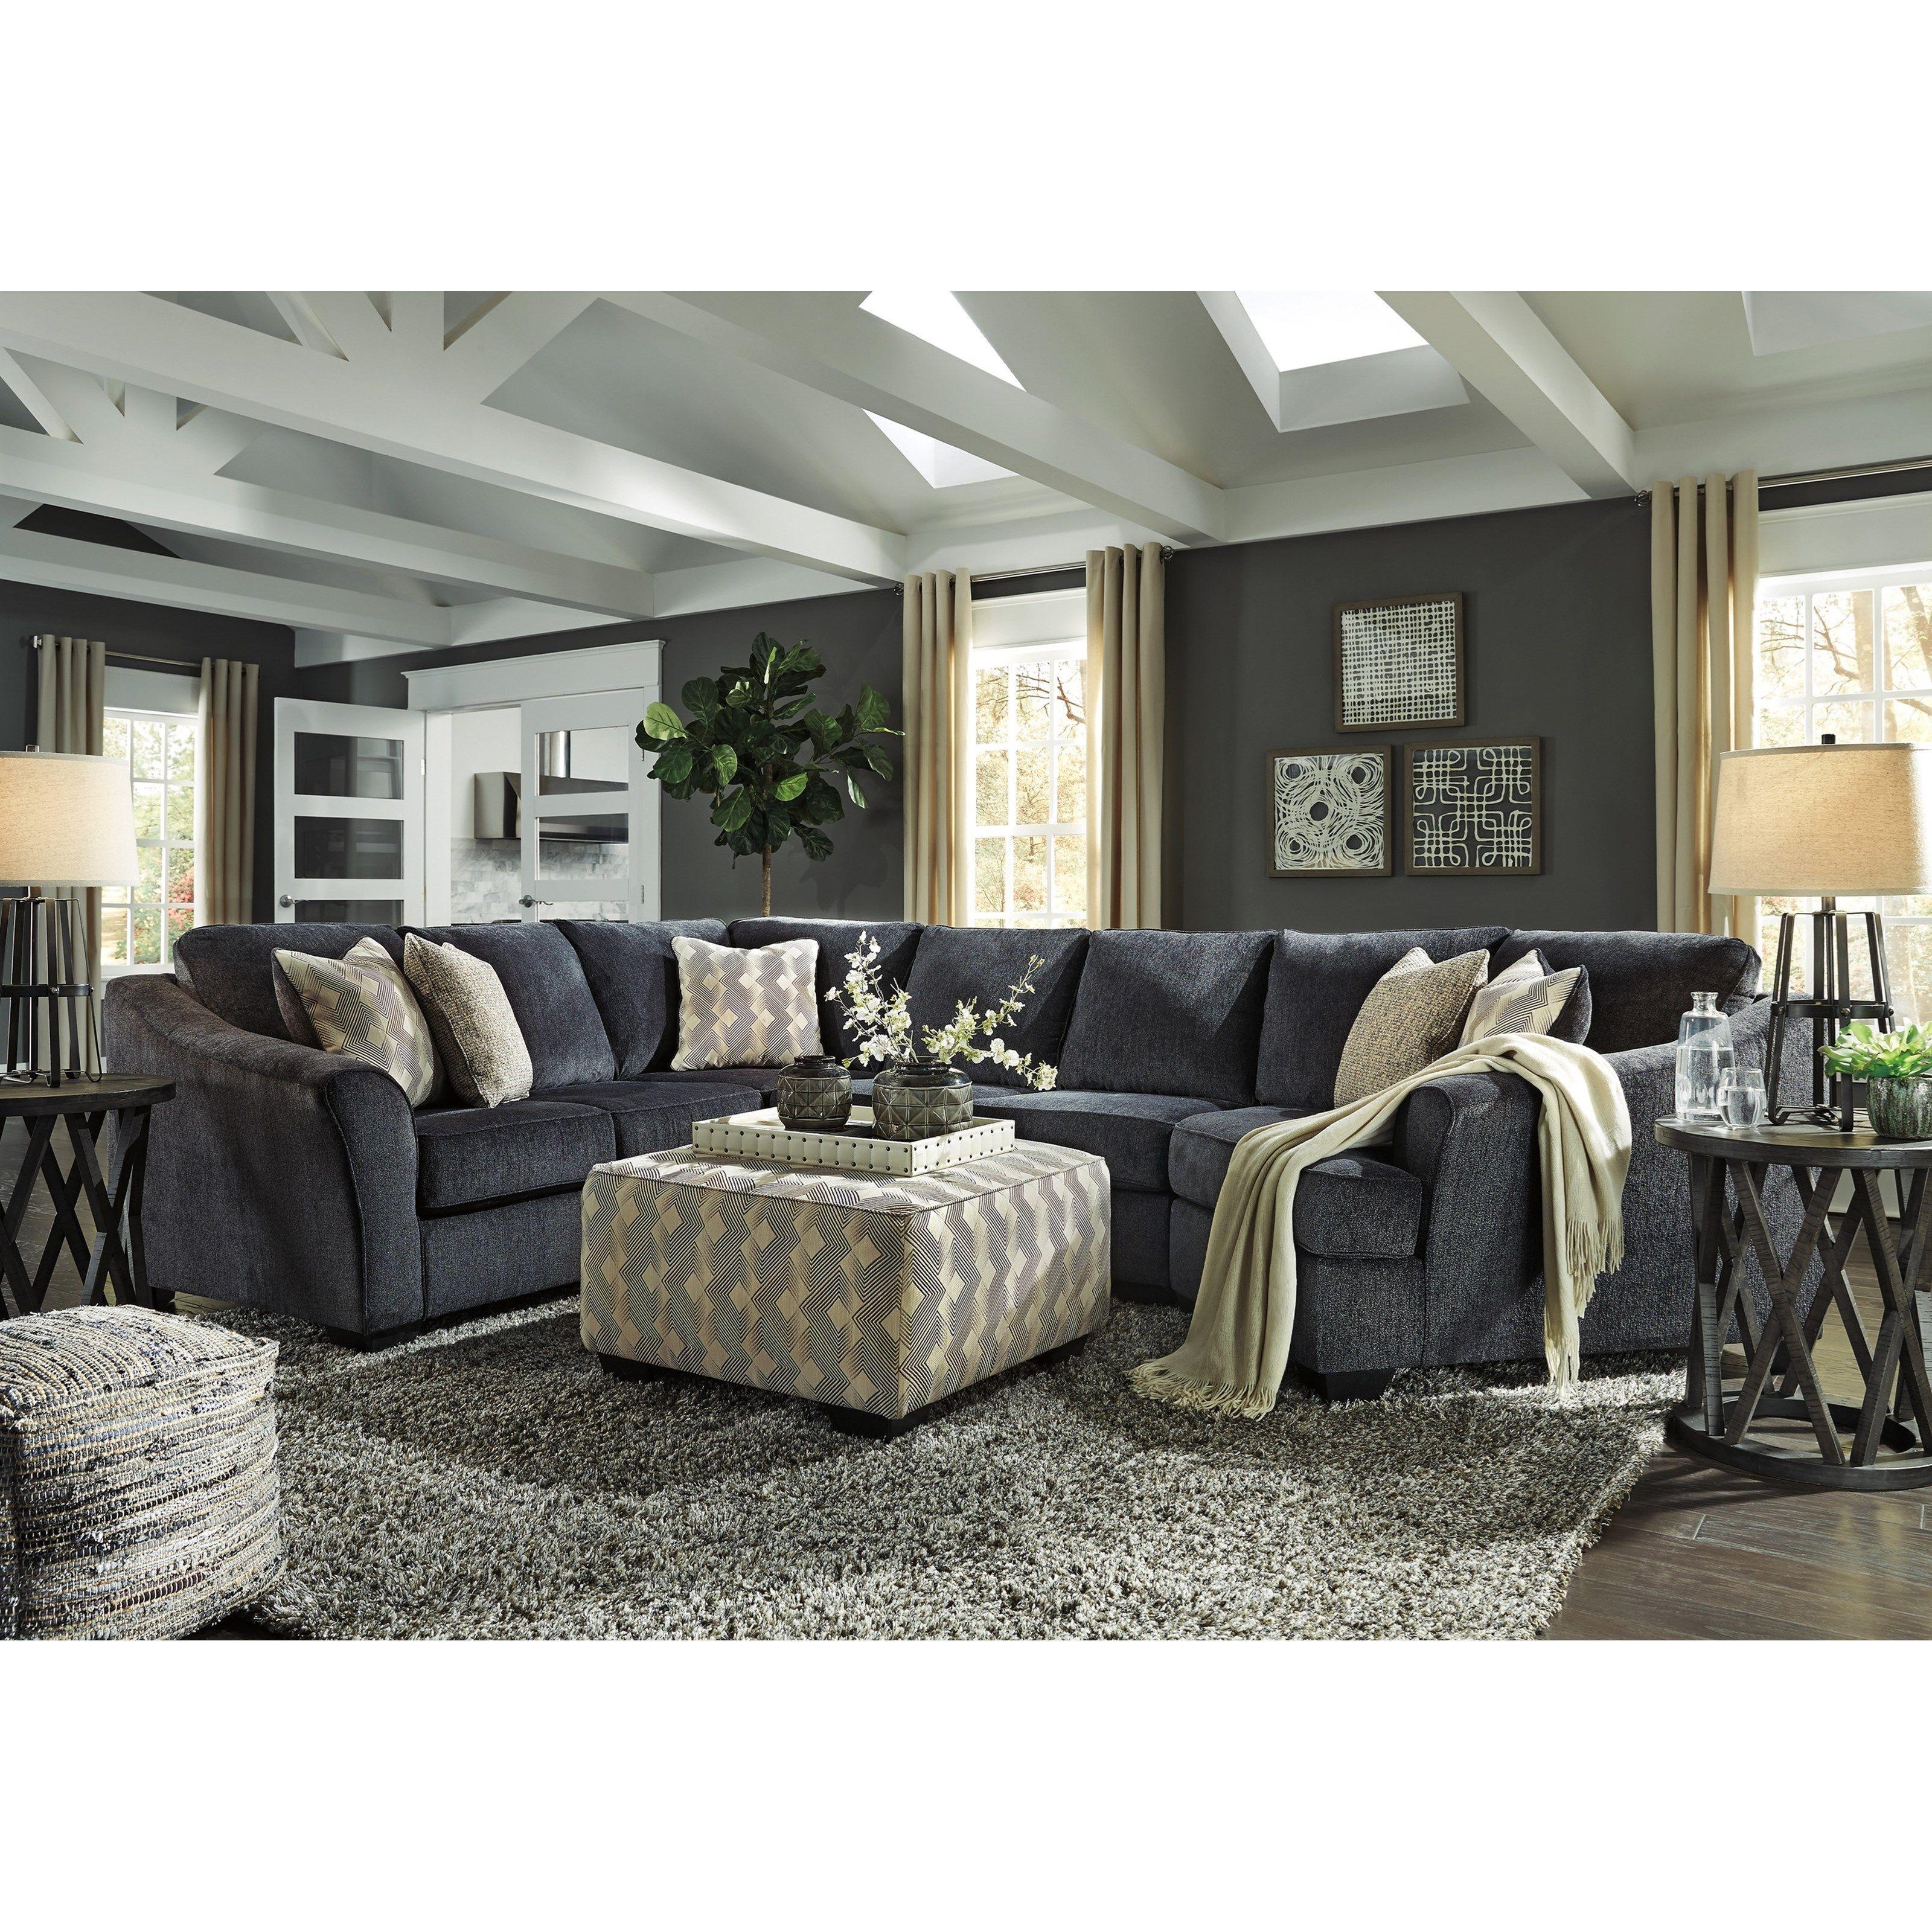 eltmann stationary living room groupashley signature